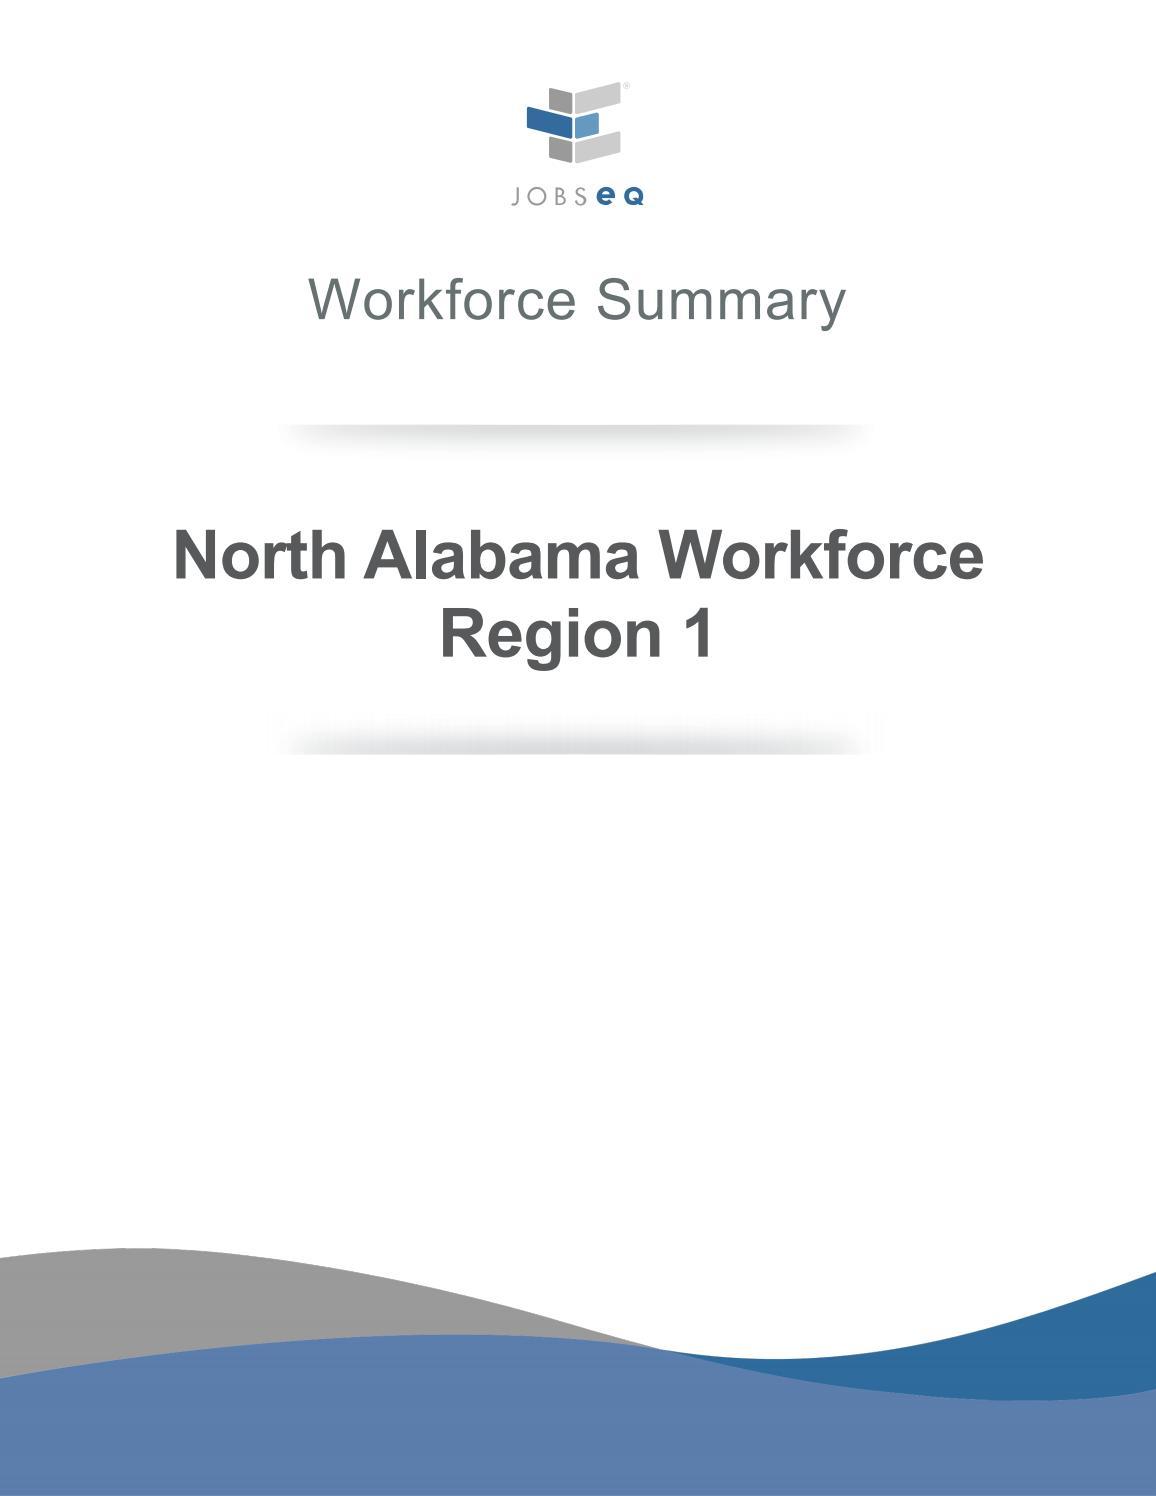 North Alabama Workforce Summary By Huntsville Madison County Chamber Issuu